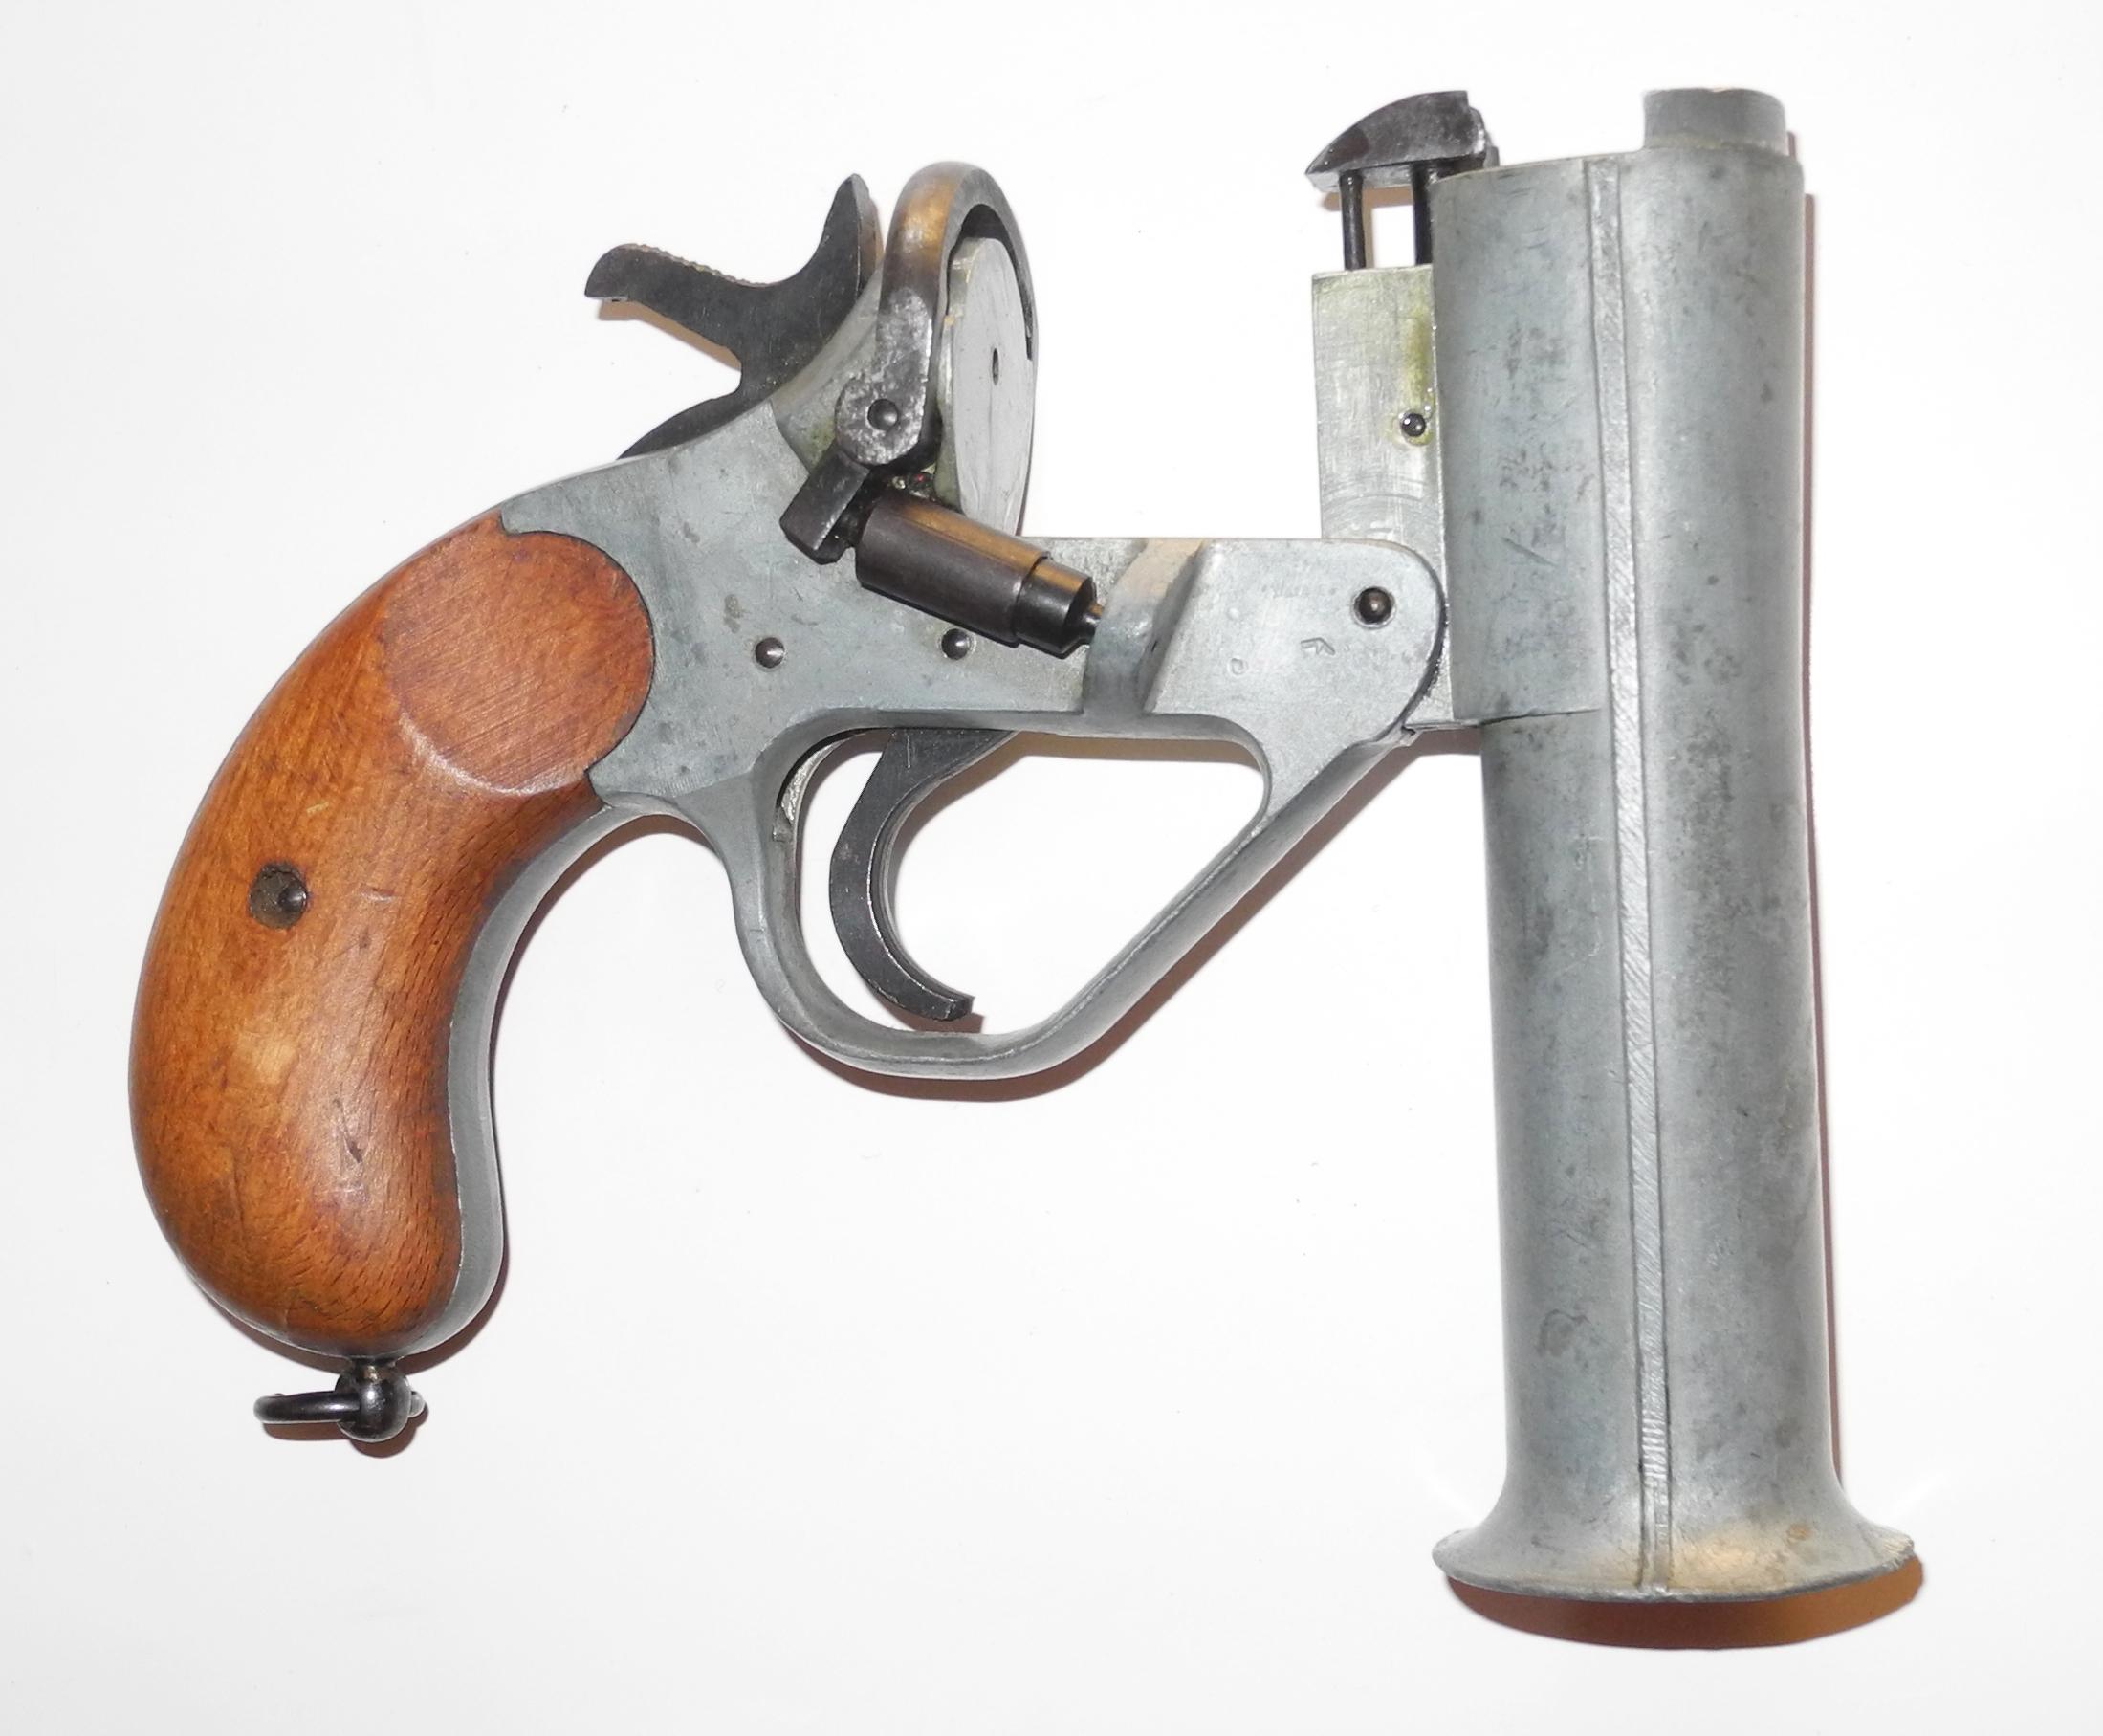 Flare pistol No. 1 Mk IV